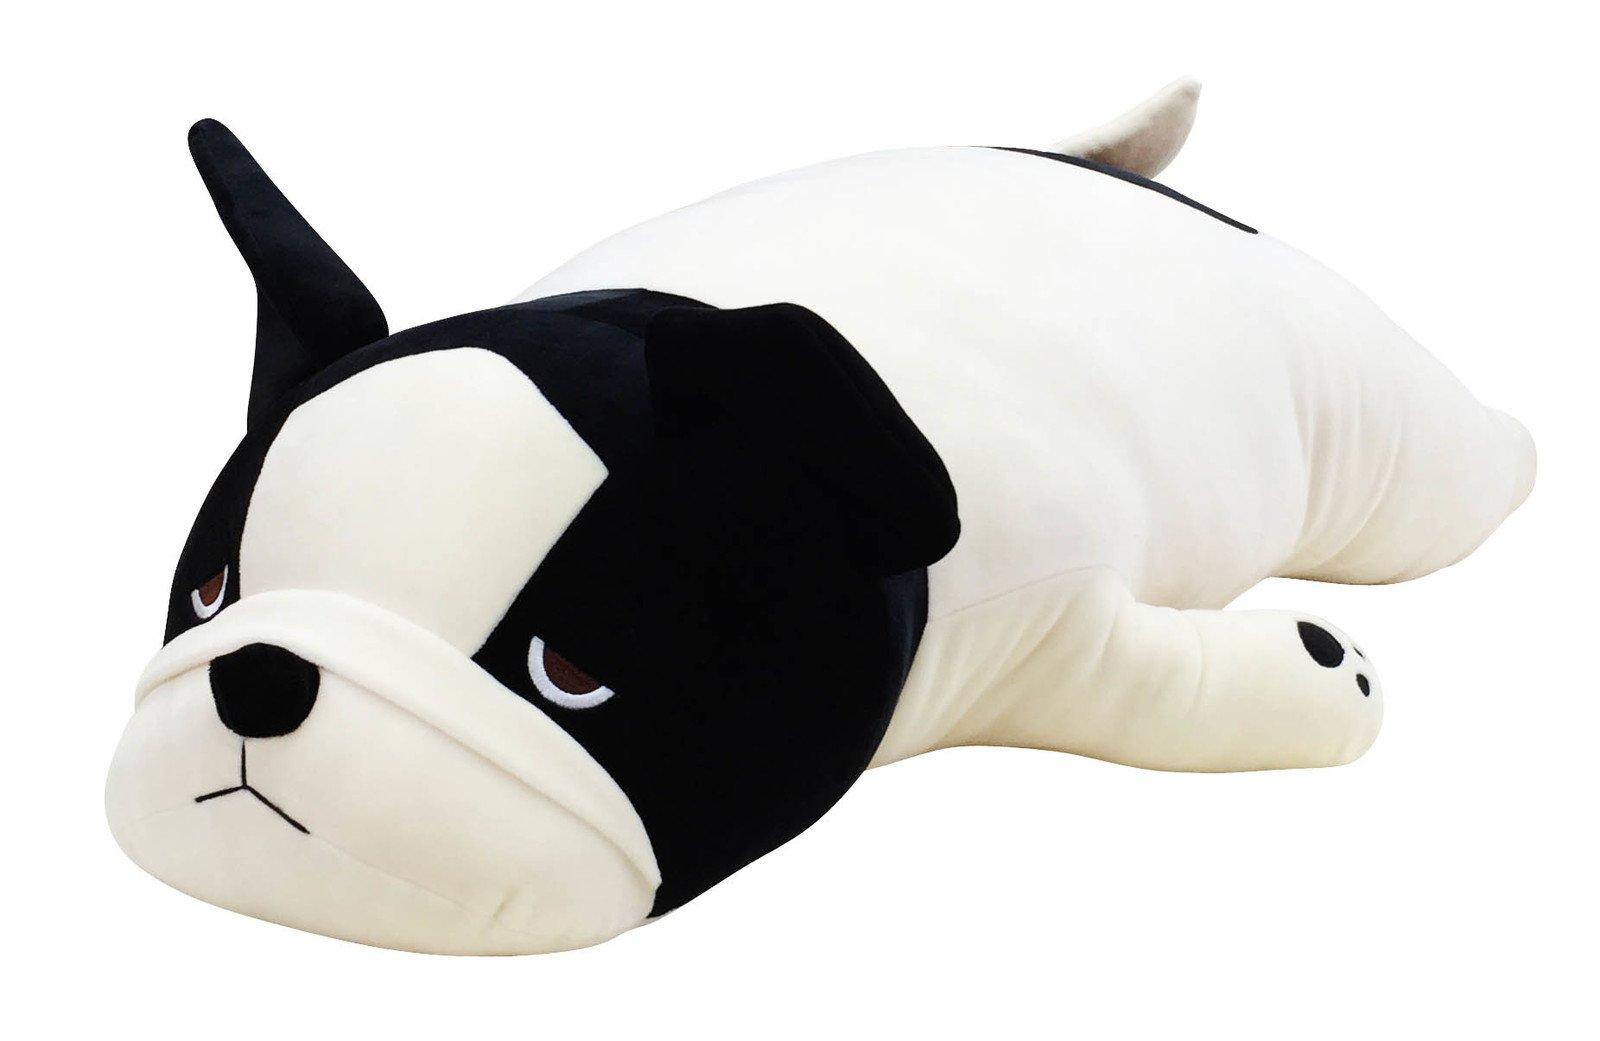 LivHeart Premium Nemu Nemu Super Soft Body Pillow Hug Pillow BIG French Bulldog Bubull from Japan